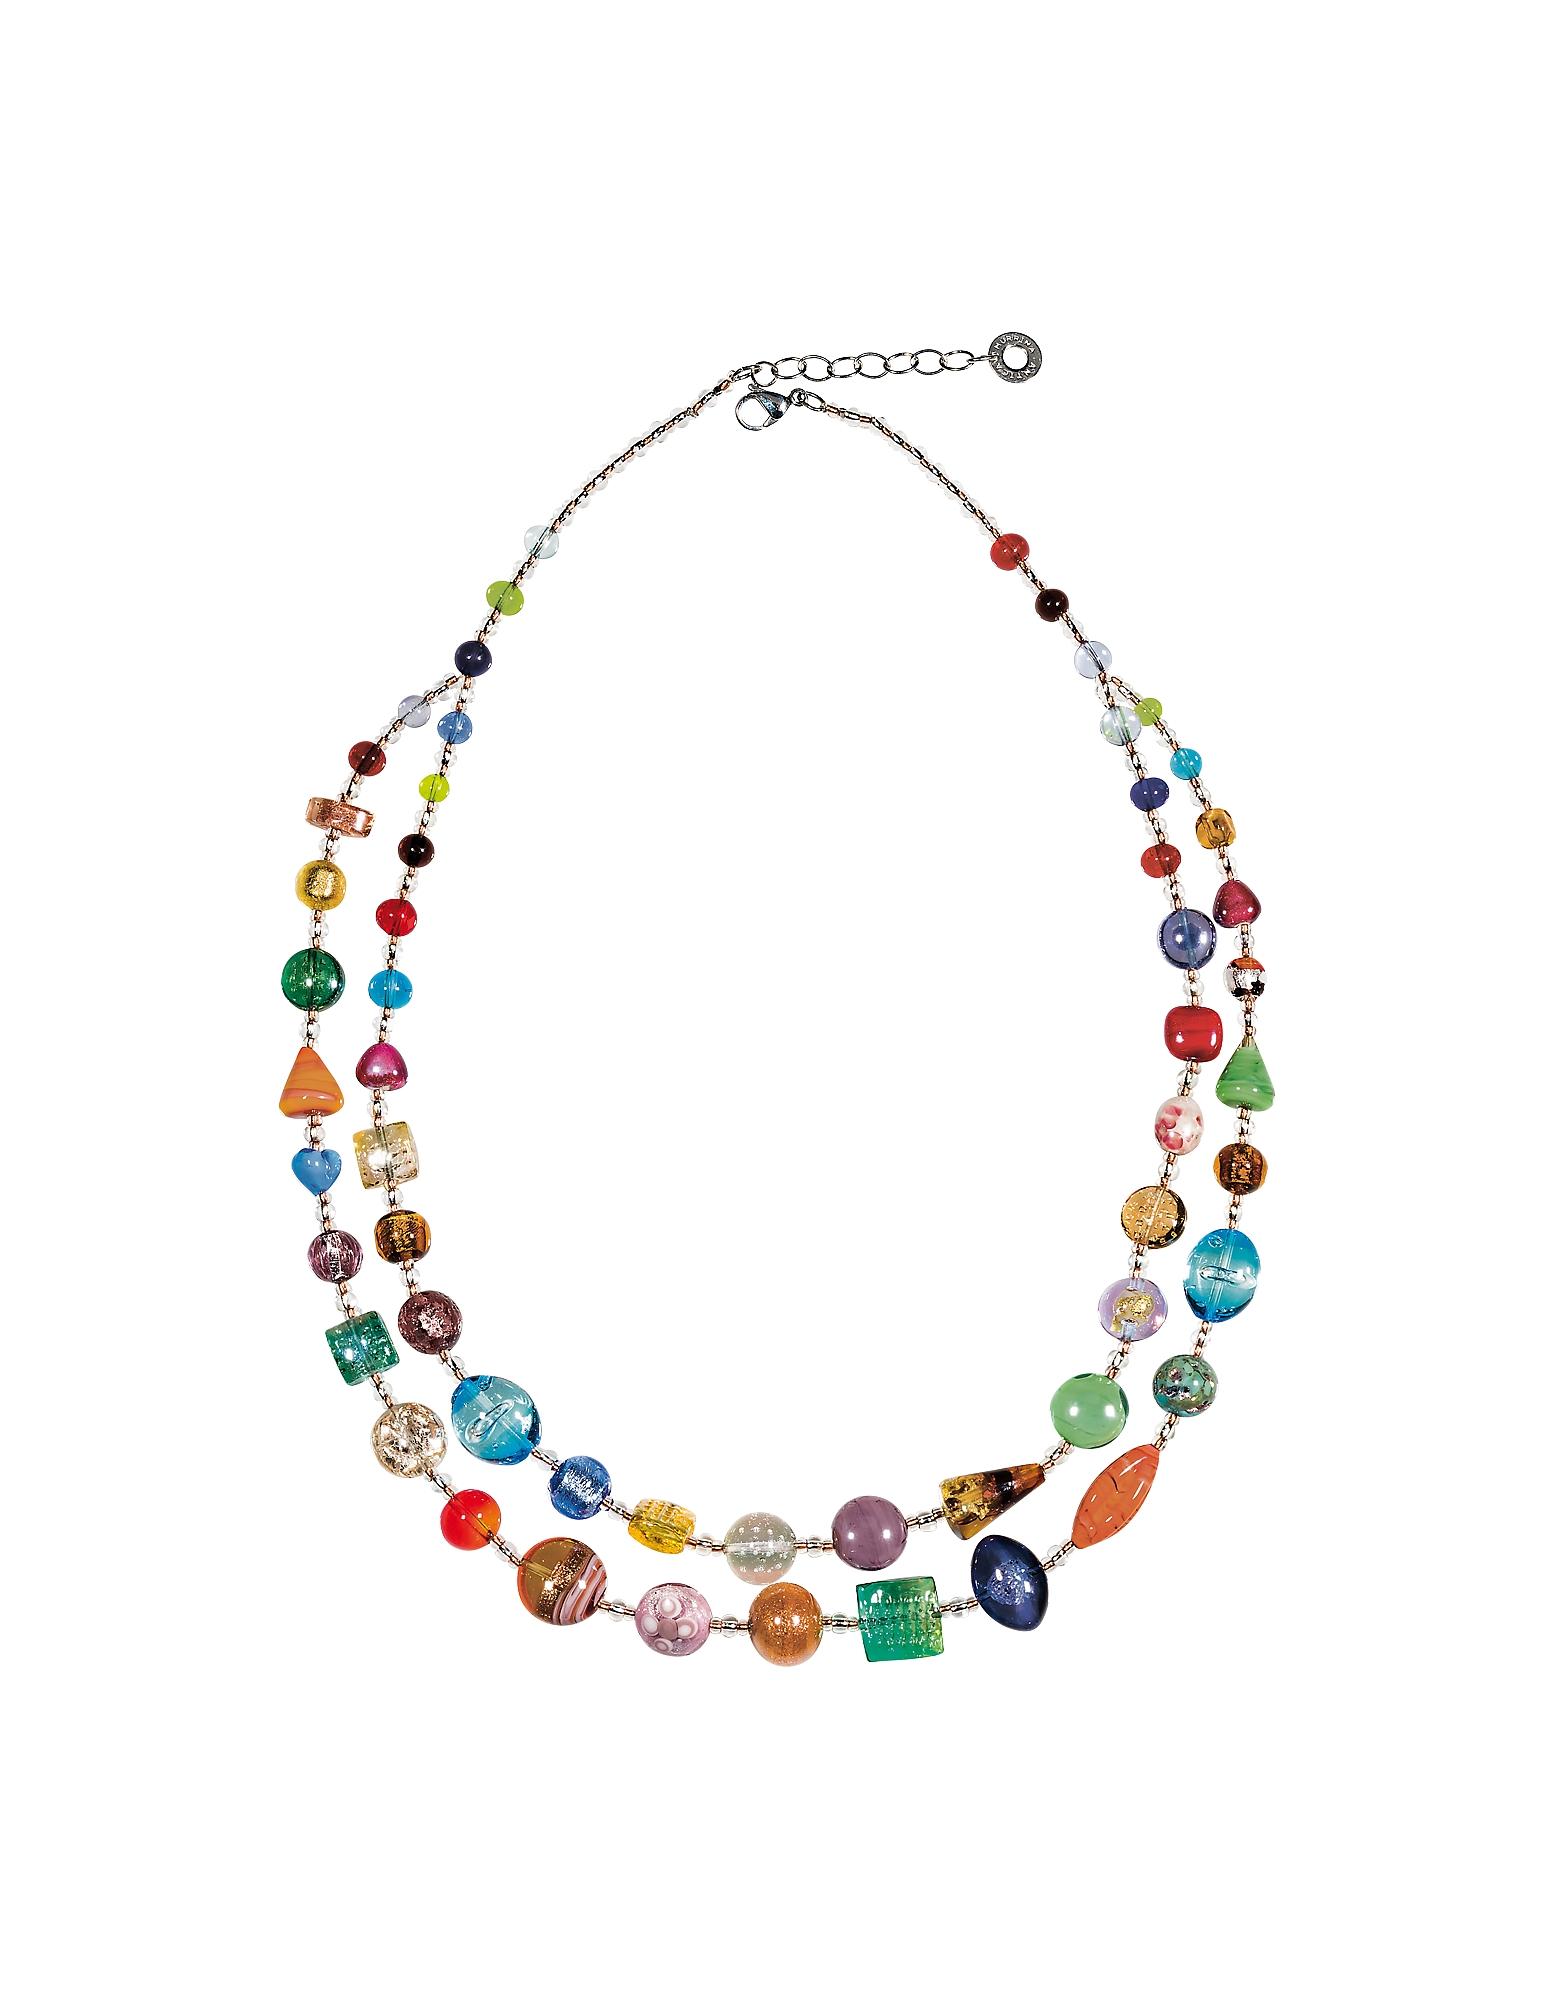 Image of Antica Murrina Designer Necklaces, Long Bouquet Necklace